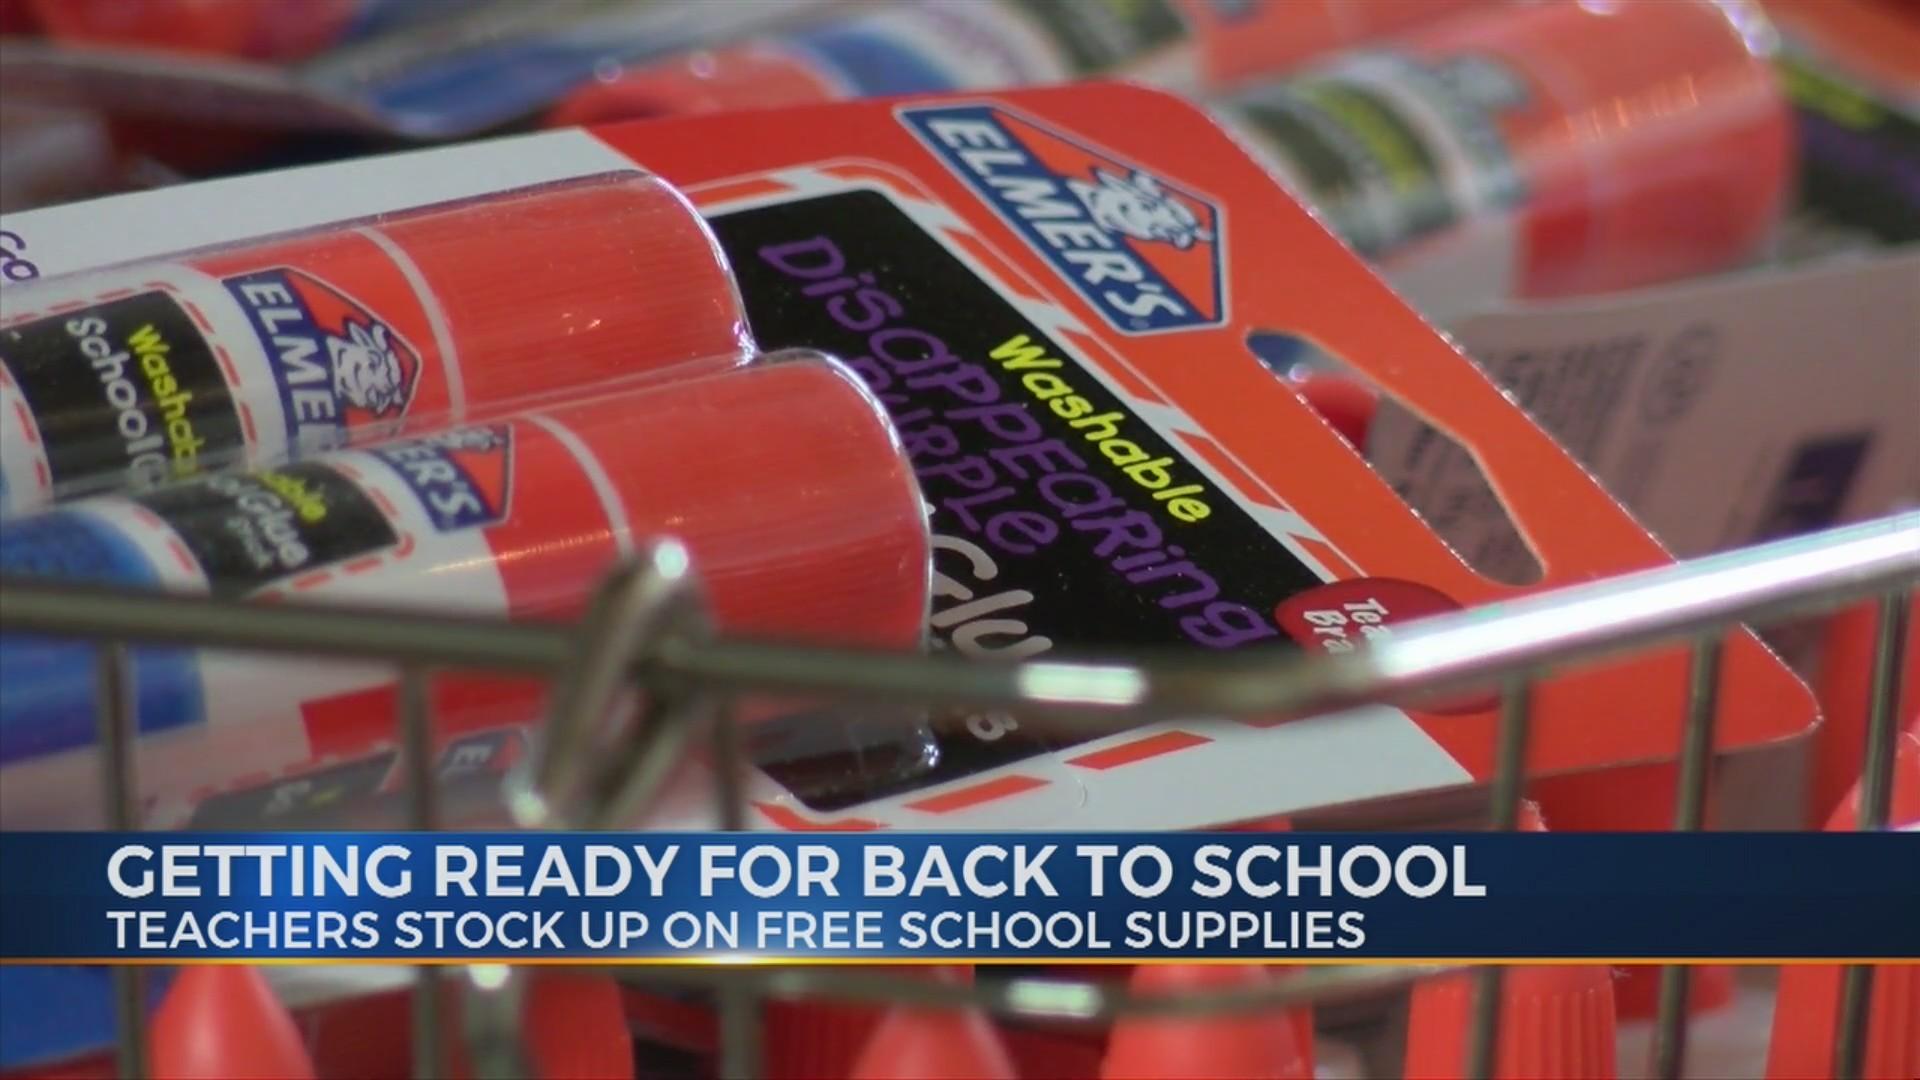 Teachers Stocking up on Free School Supplies